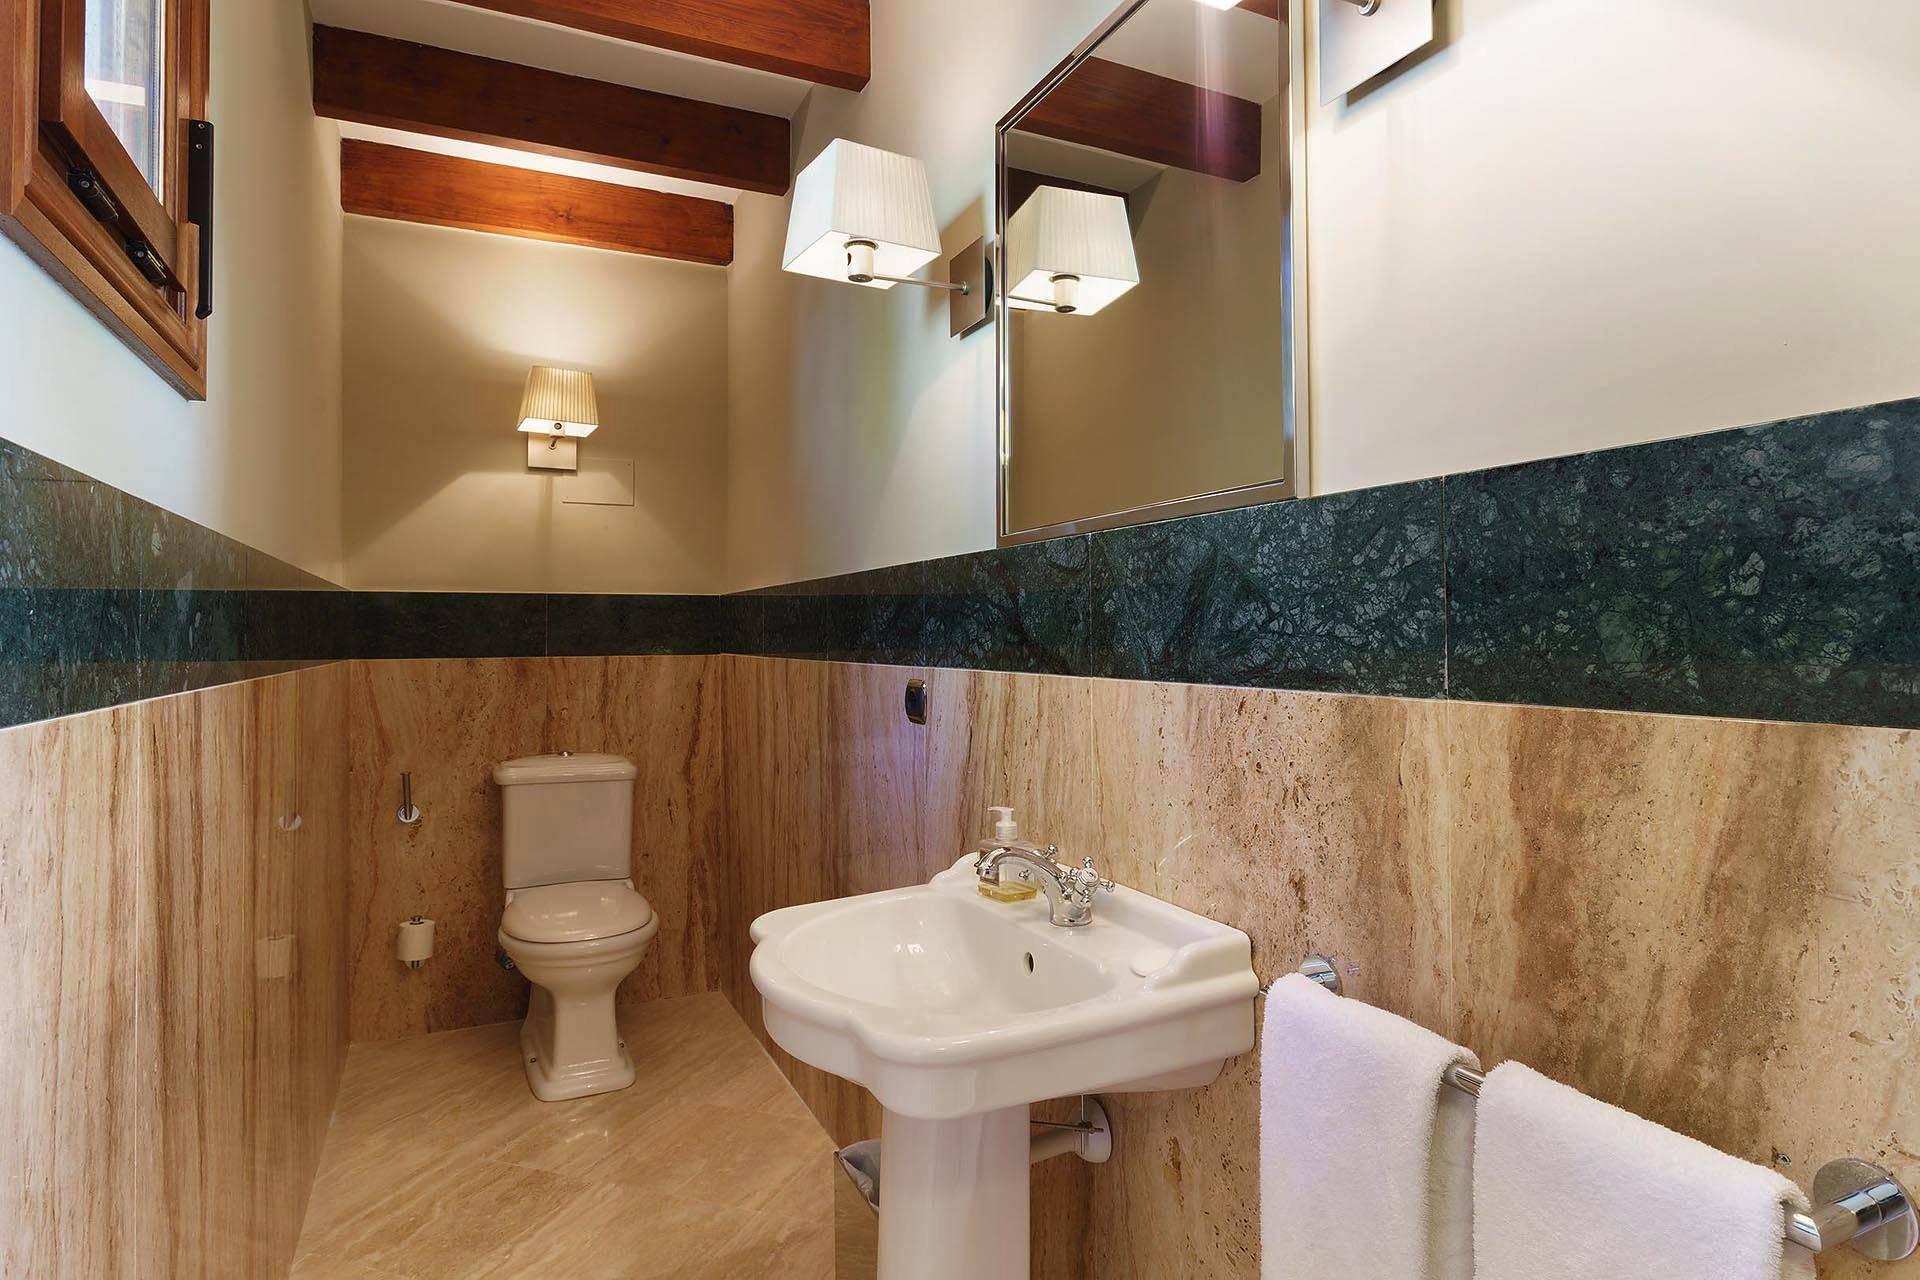 01-280 großzügige Villa nahe Palma de Mallorca Bild 26